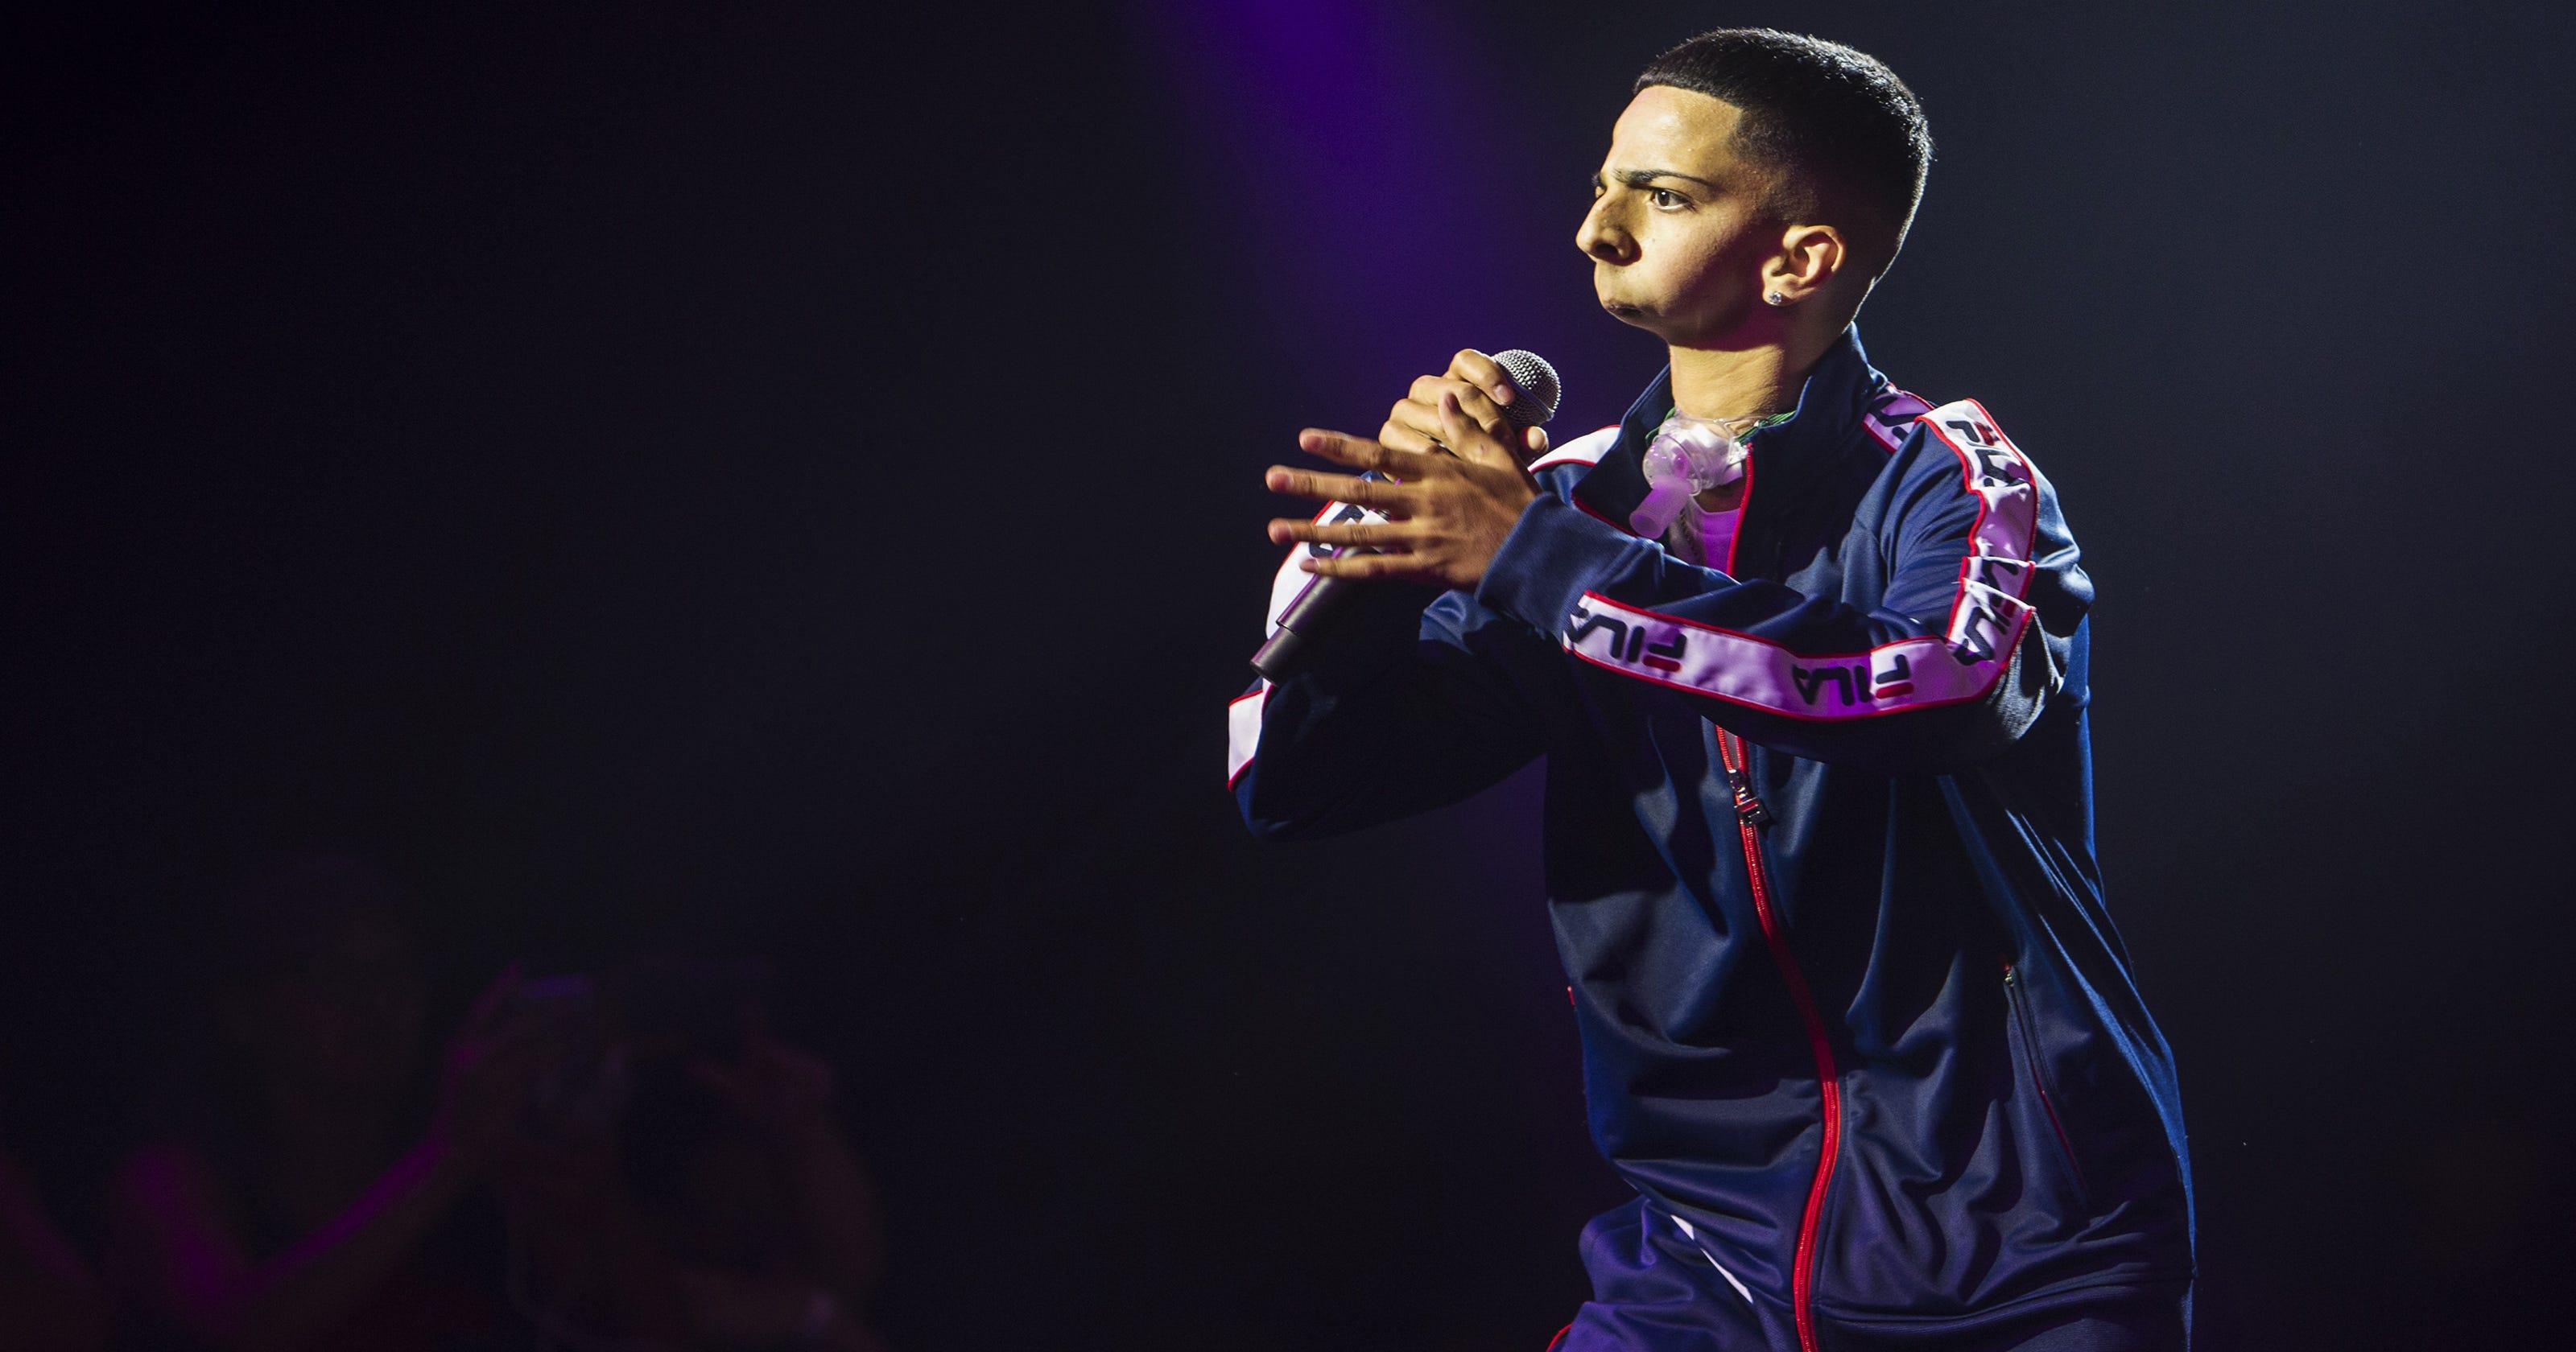 ec67d816bf731 Mute teen rapper Isaiah Acosta looks to life after graduation